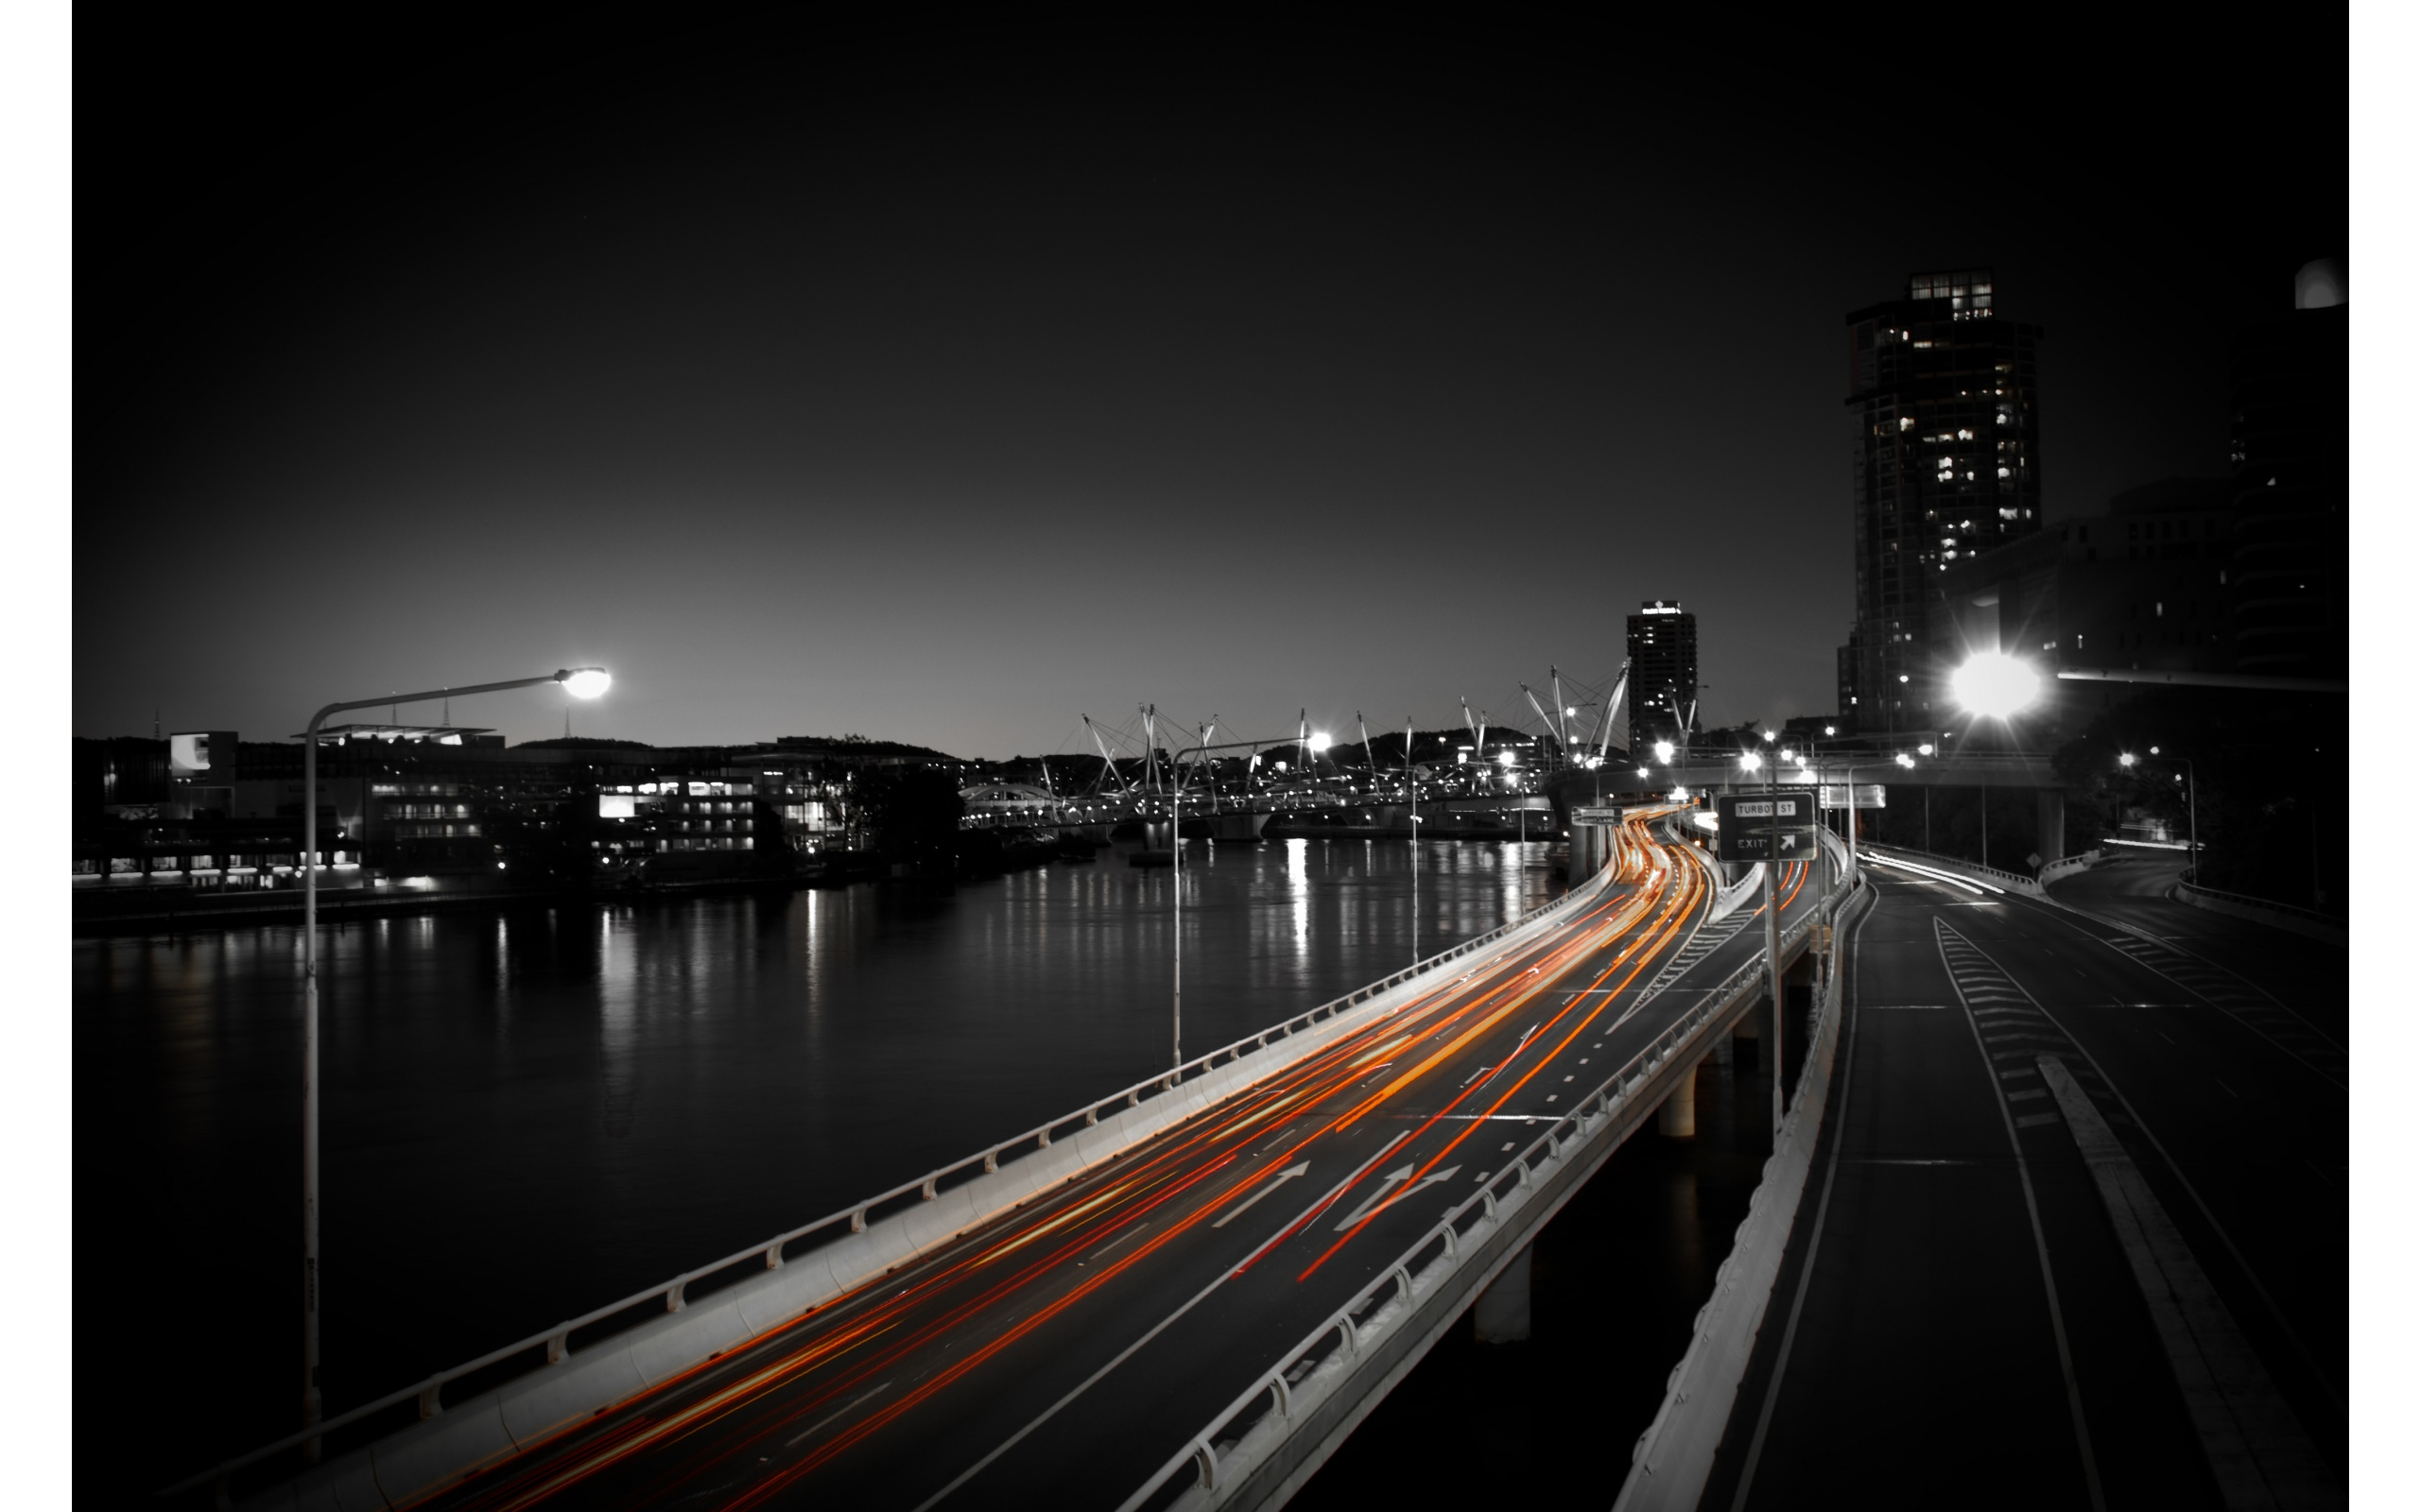 City Dark Night And Light Road 2560 x 1600 Download Close 2560x1600